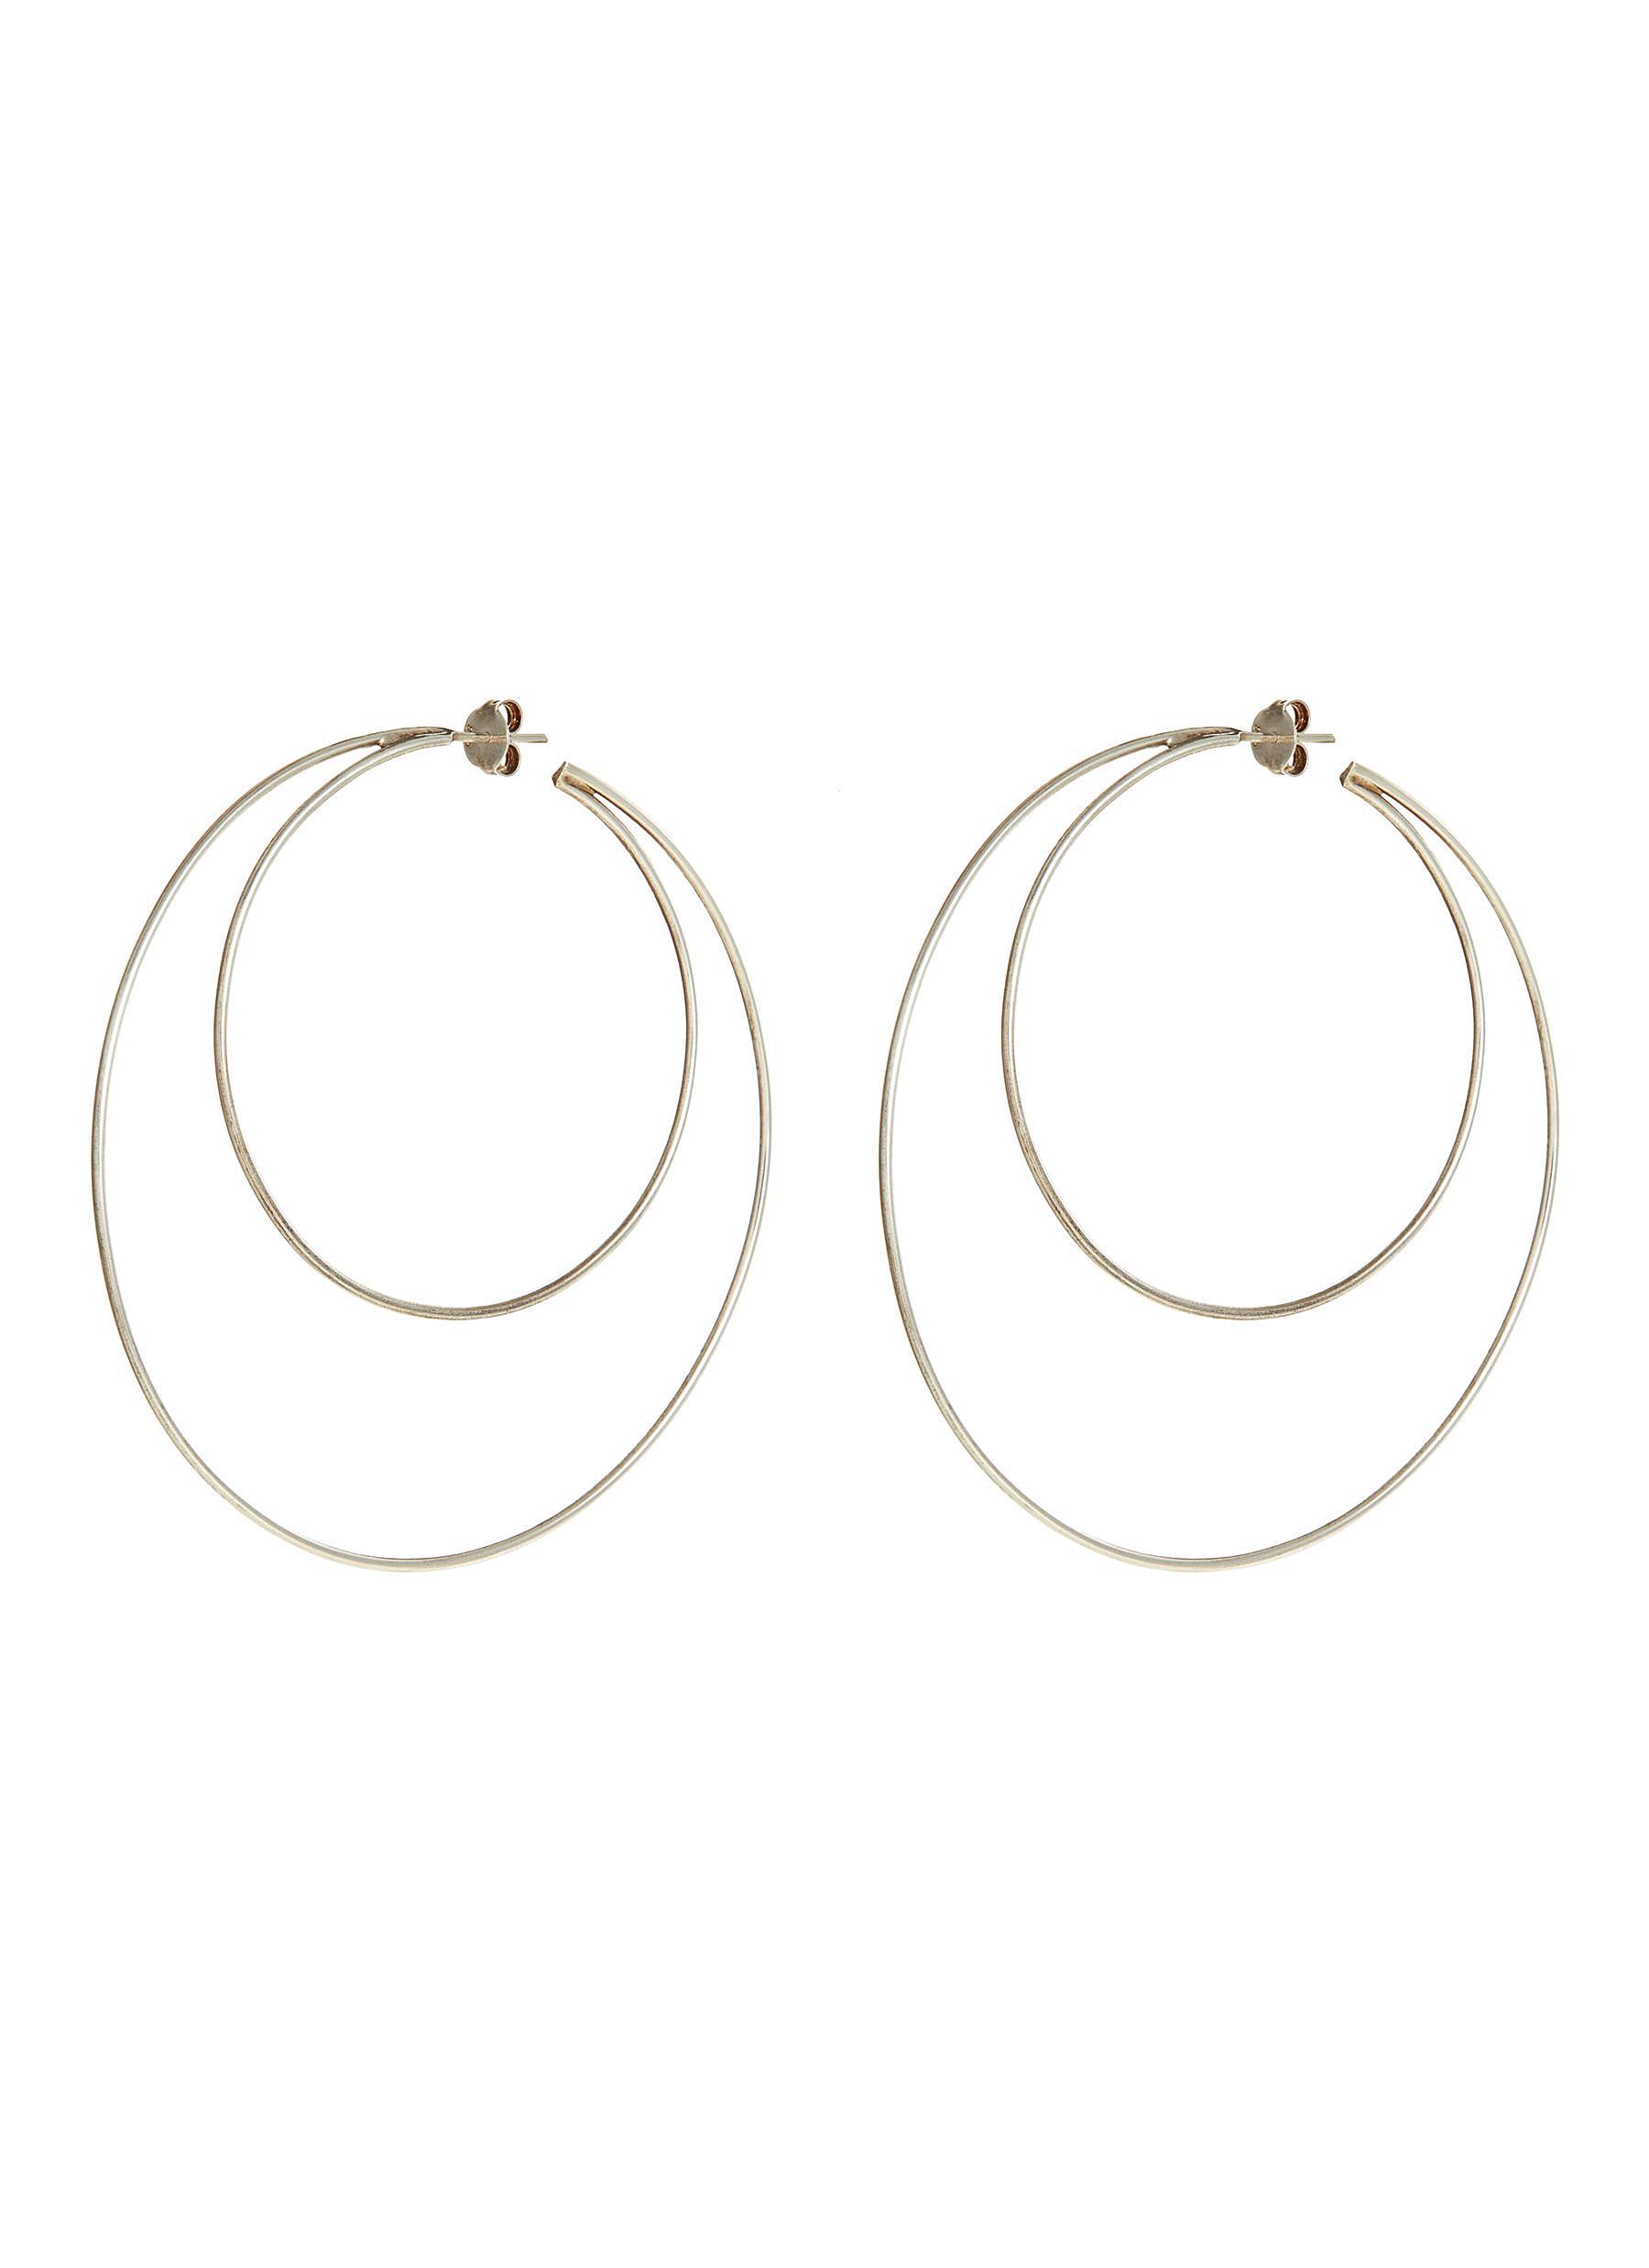 'Crescent Hoops' silver earrings